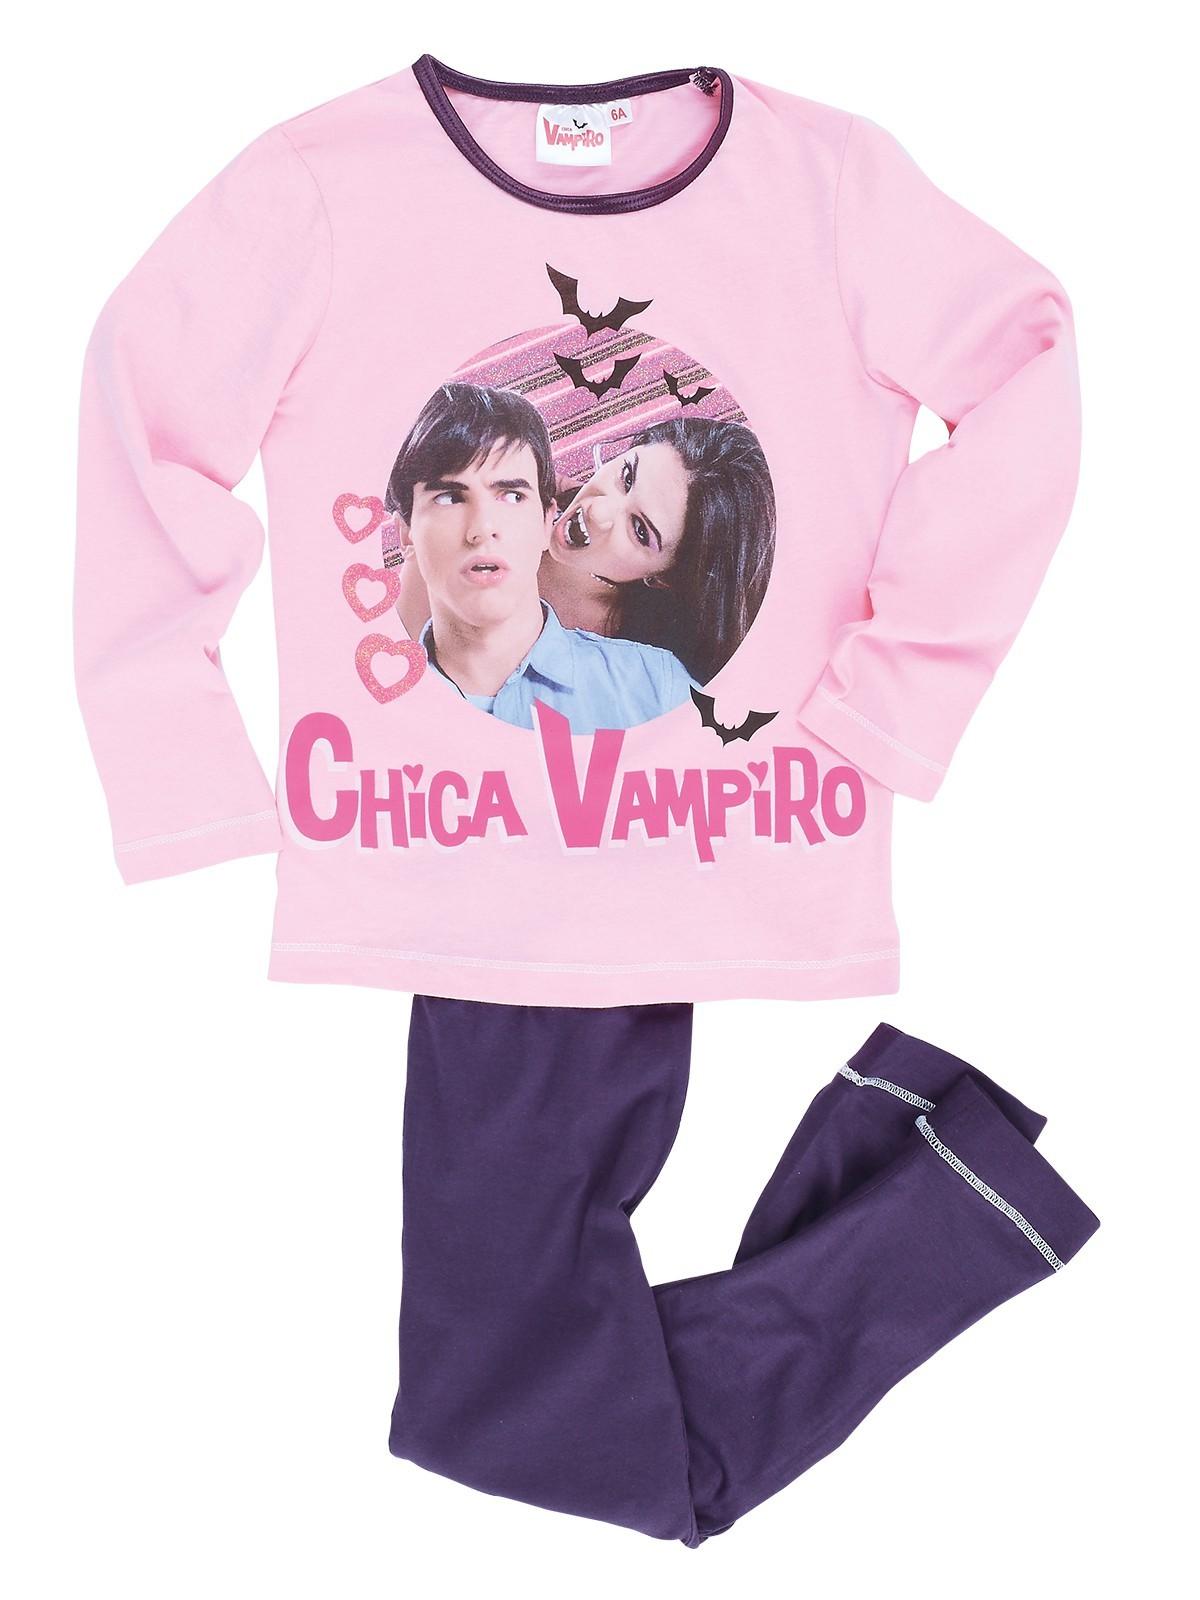 8fa2e582d96a6 Pyjama fille Chica Vampiro (6-12A) - DistriCenter